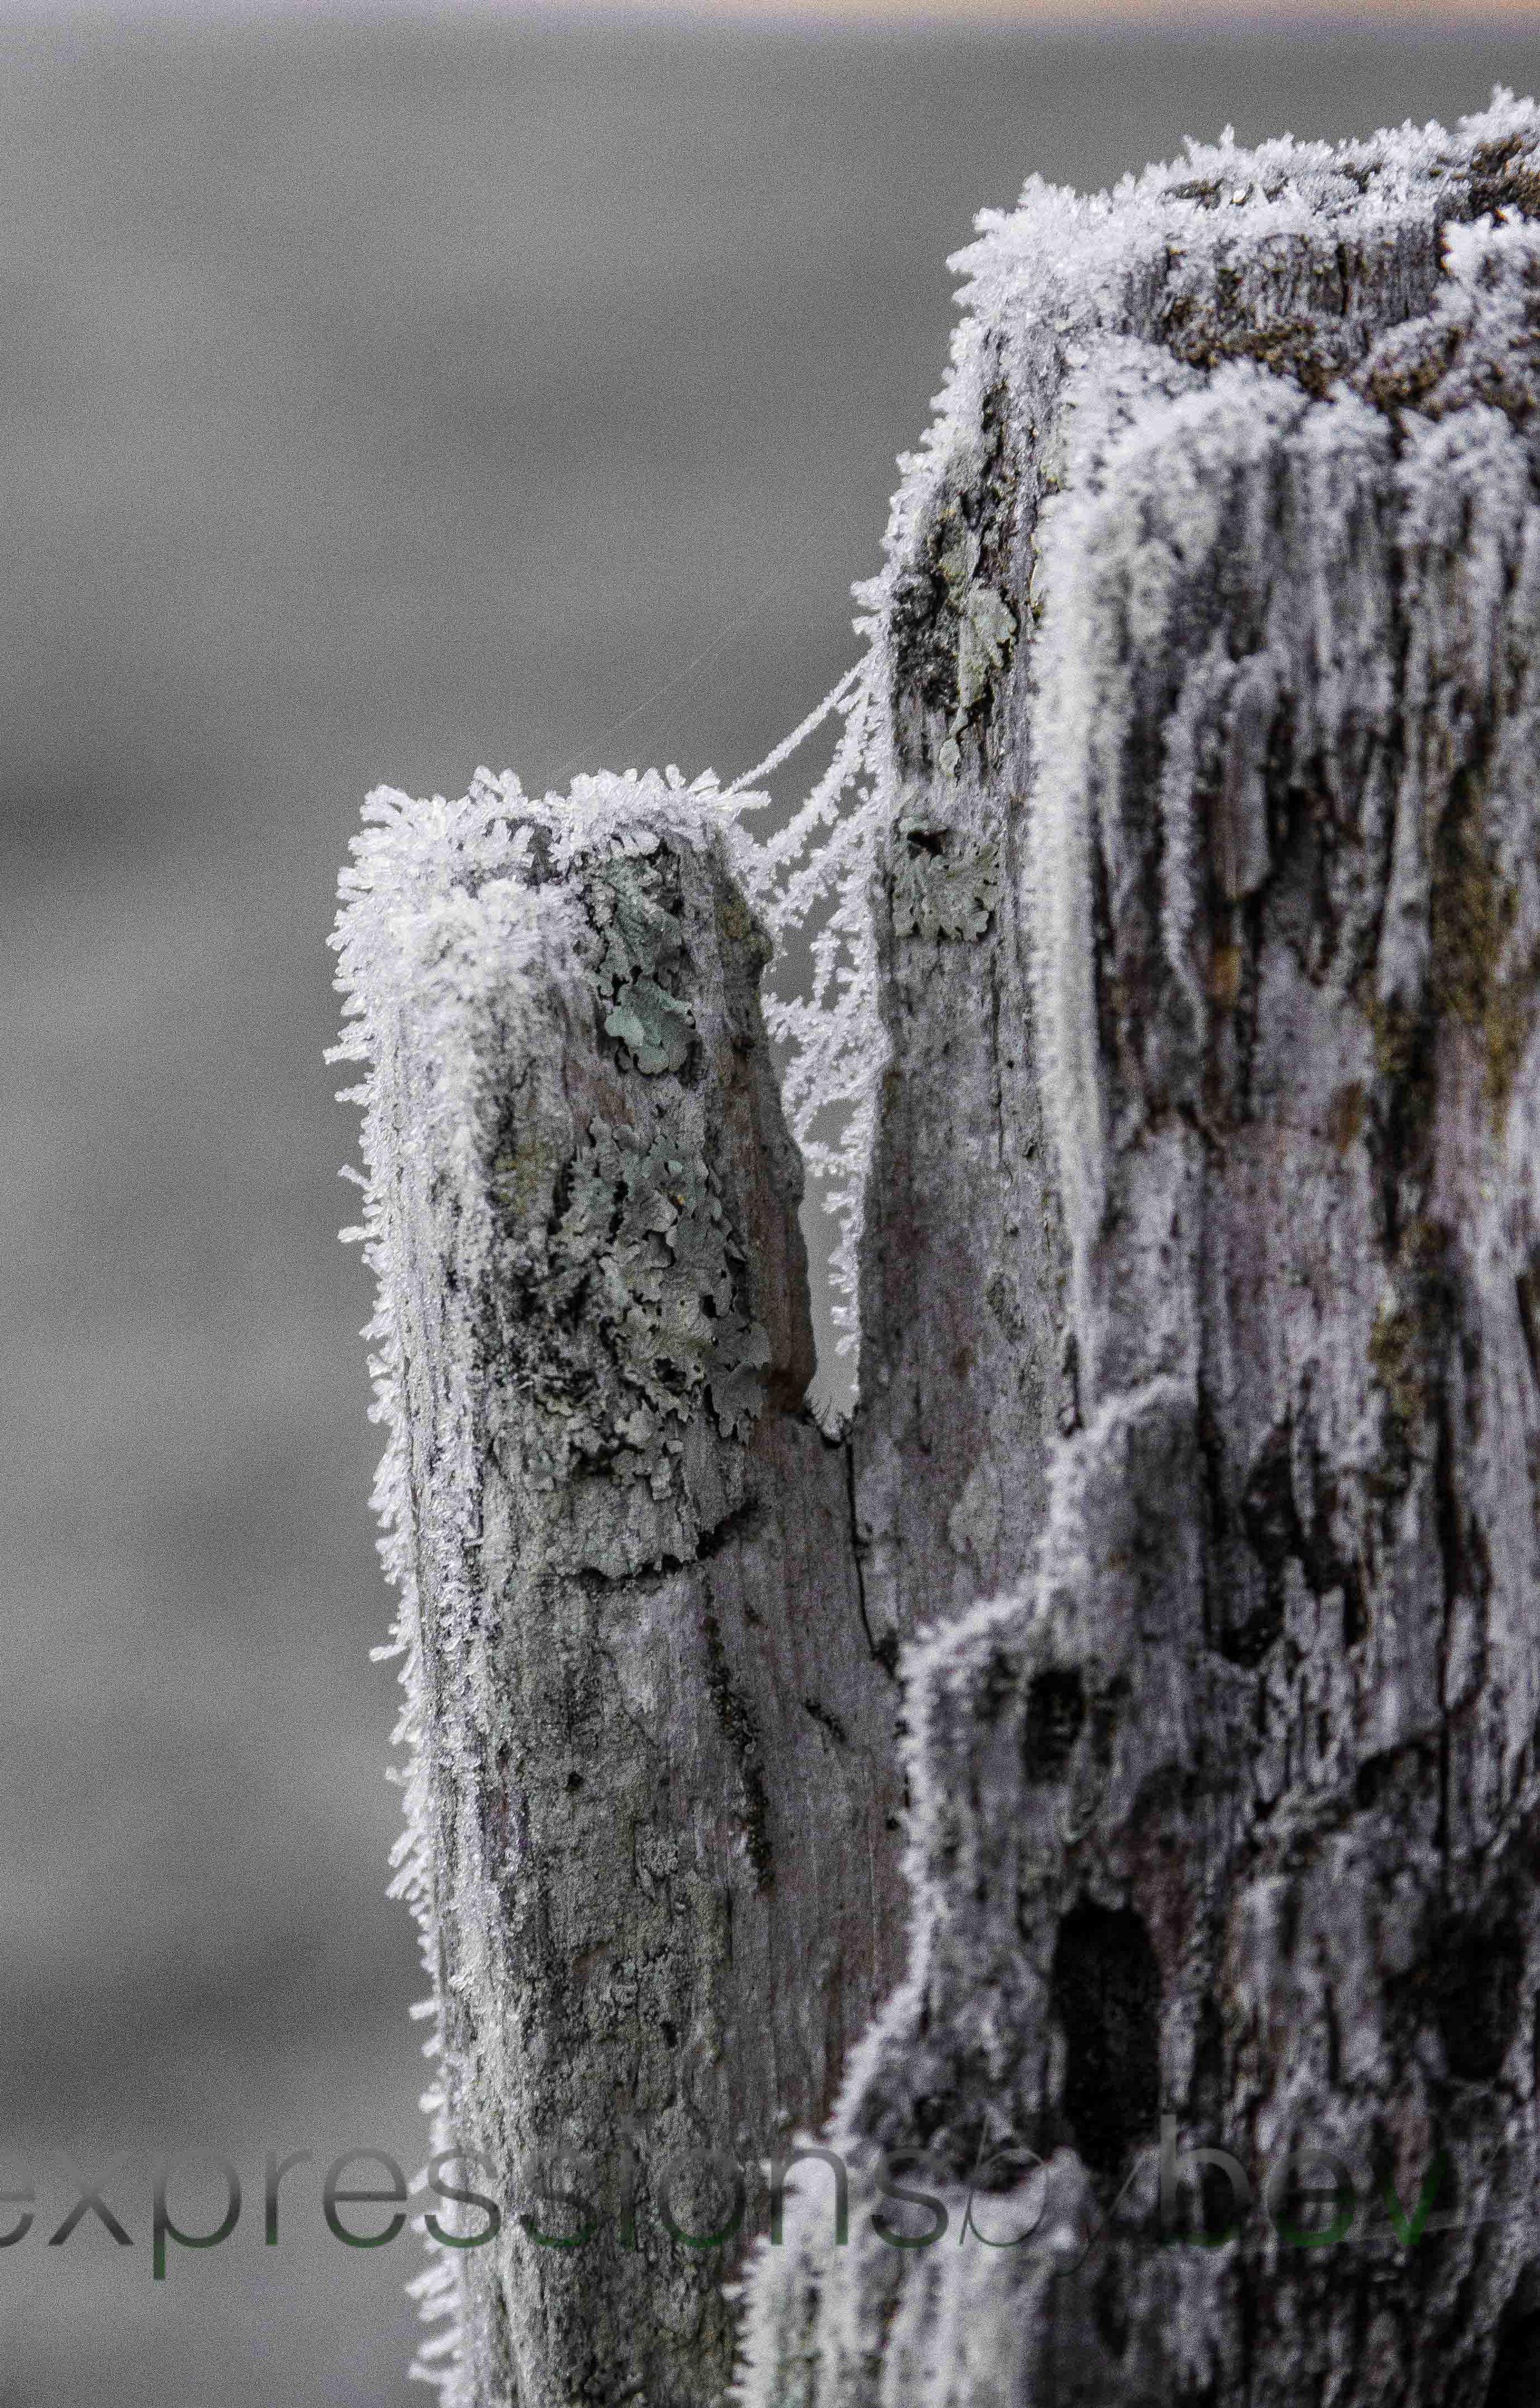 EBBev-2013-CNPA cades cove,treemont,roaring fork,sunrise,frost,spiderwebs,-3509-15_-57.jpg